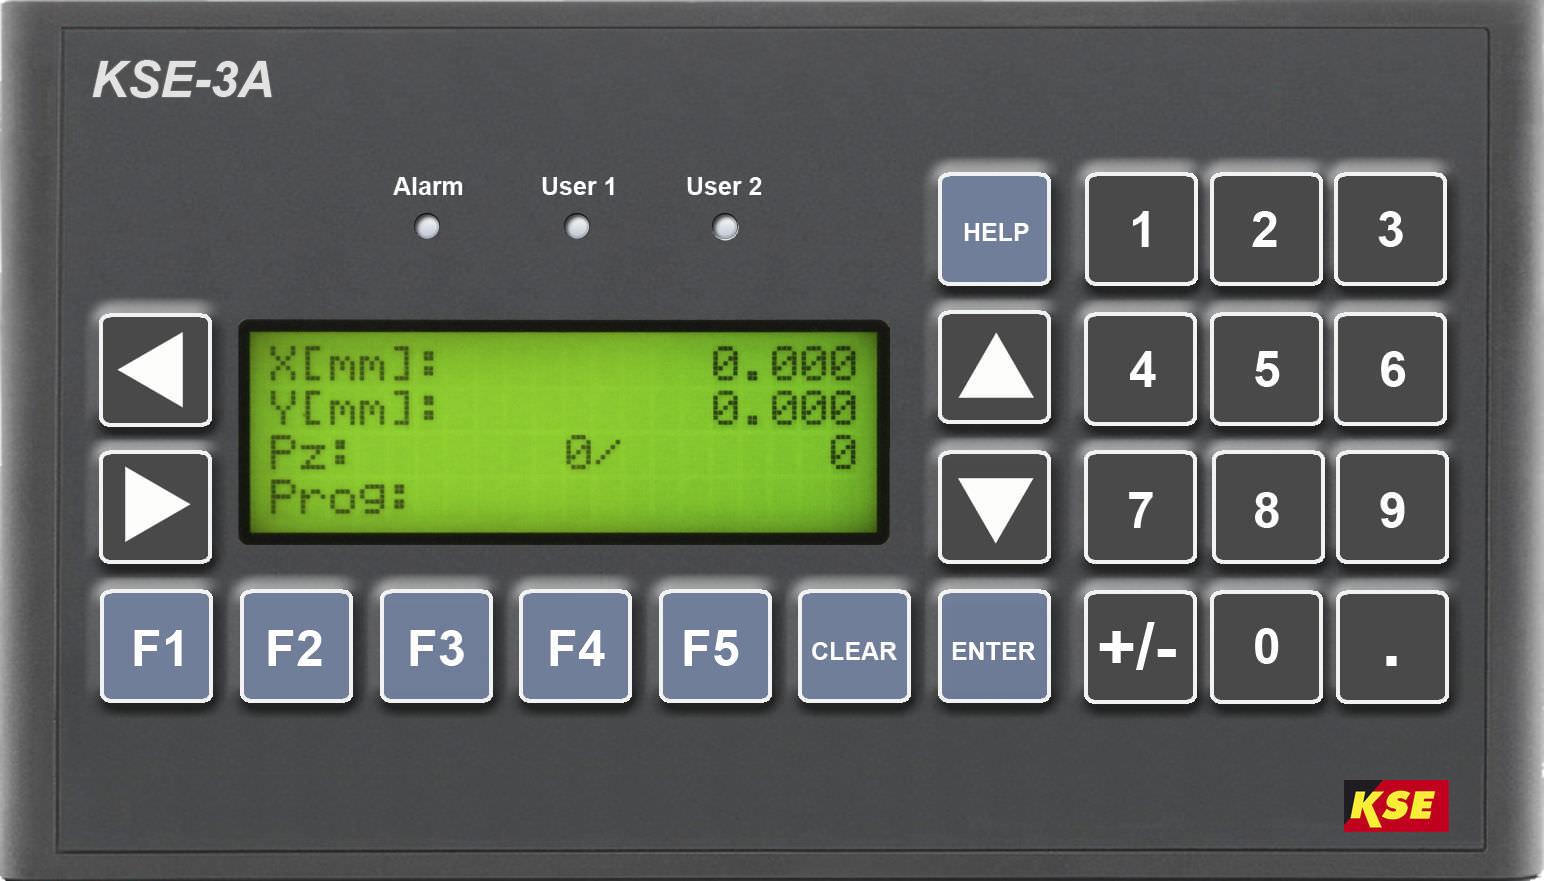 3 Axis Cnc Controller Compact Kse 3a